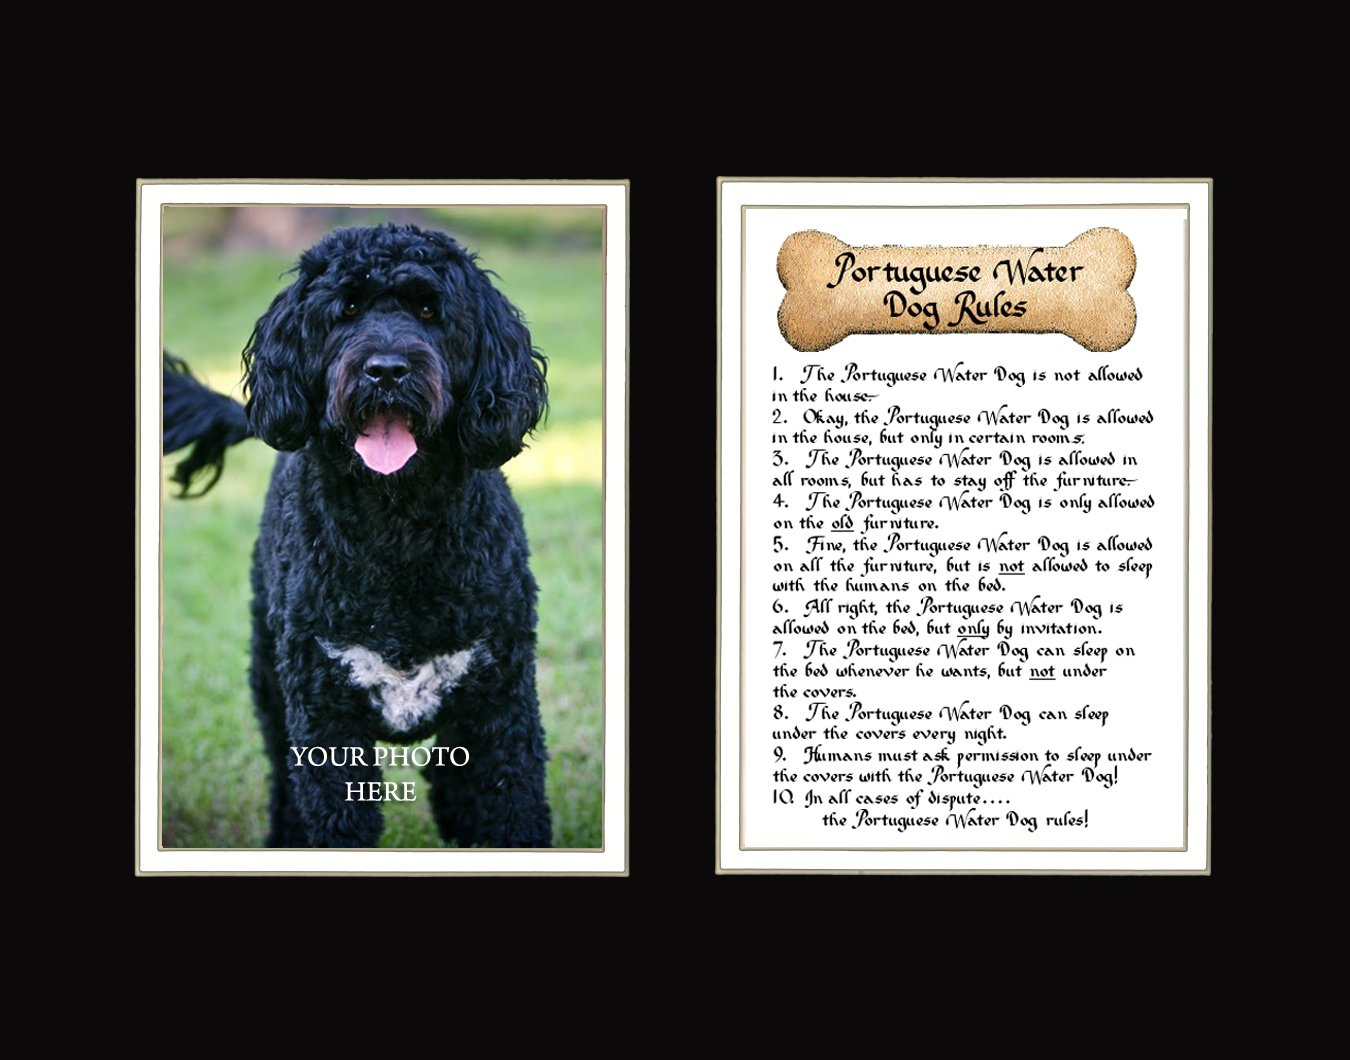 Dog Rules Portuguese Water Dog Wall Decor Pet Dog Saying Gift 1